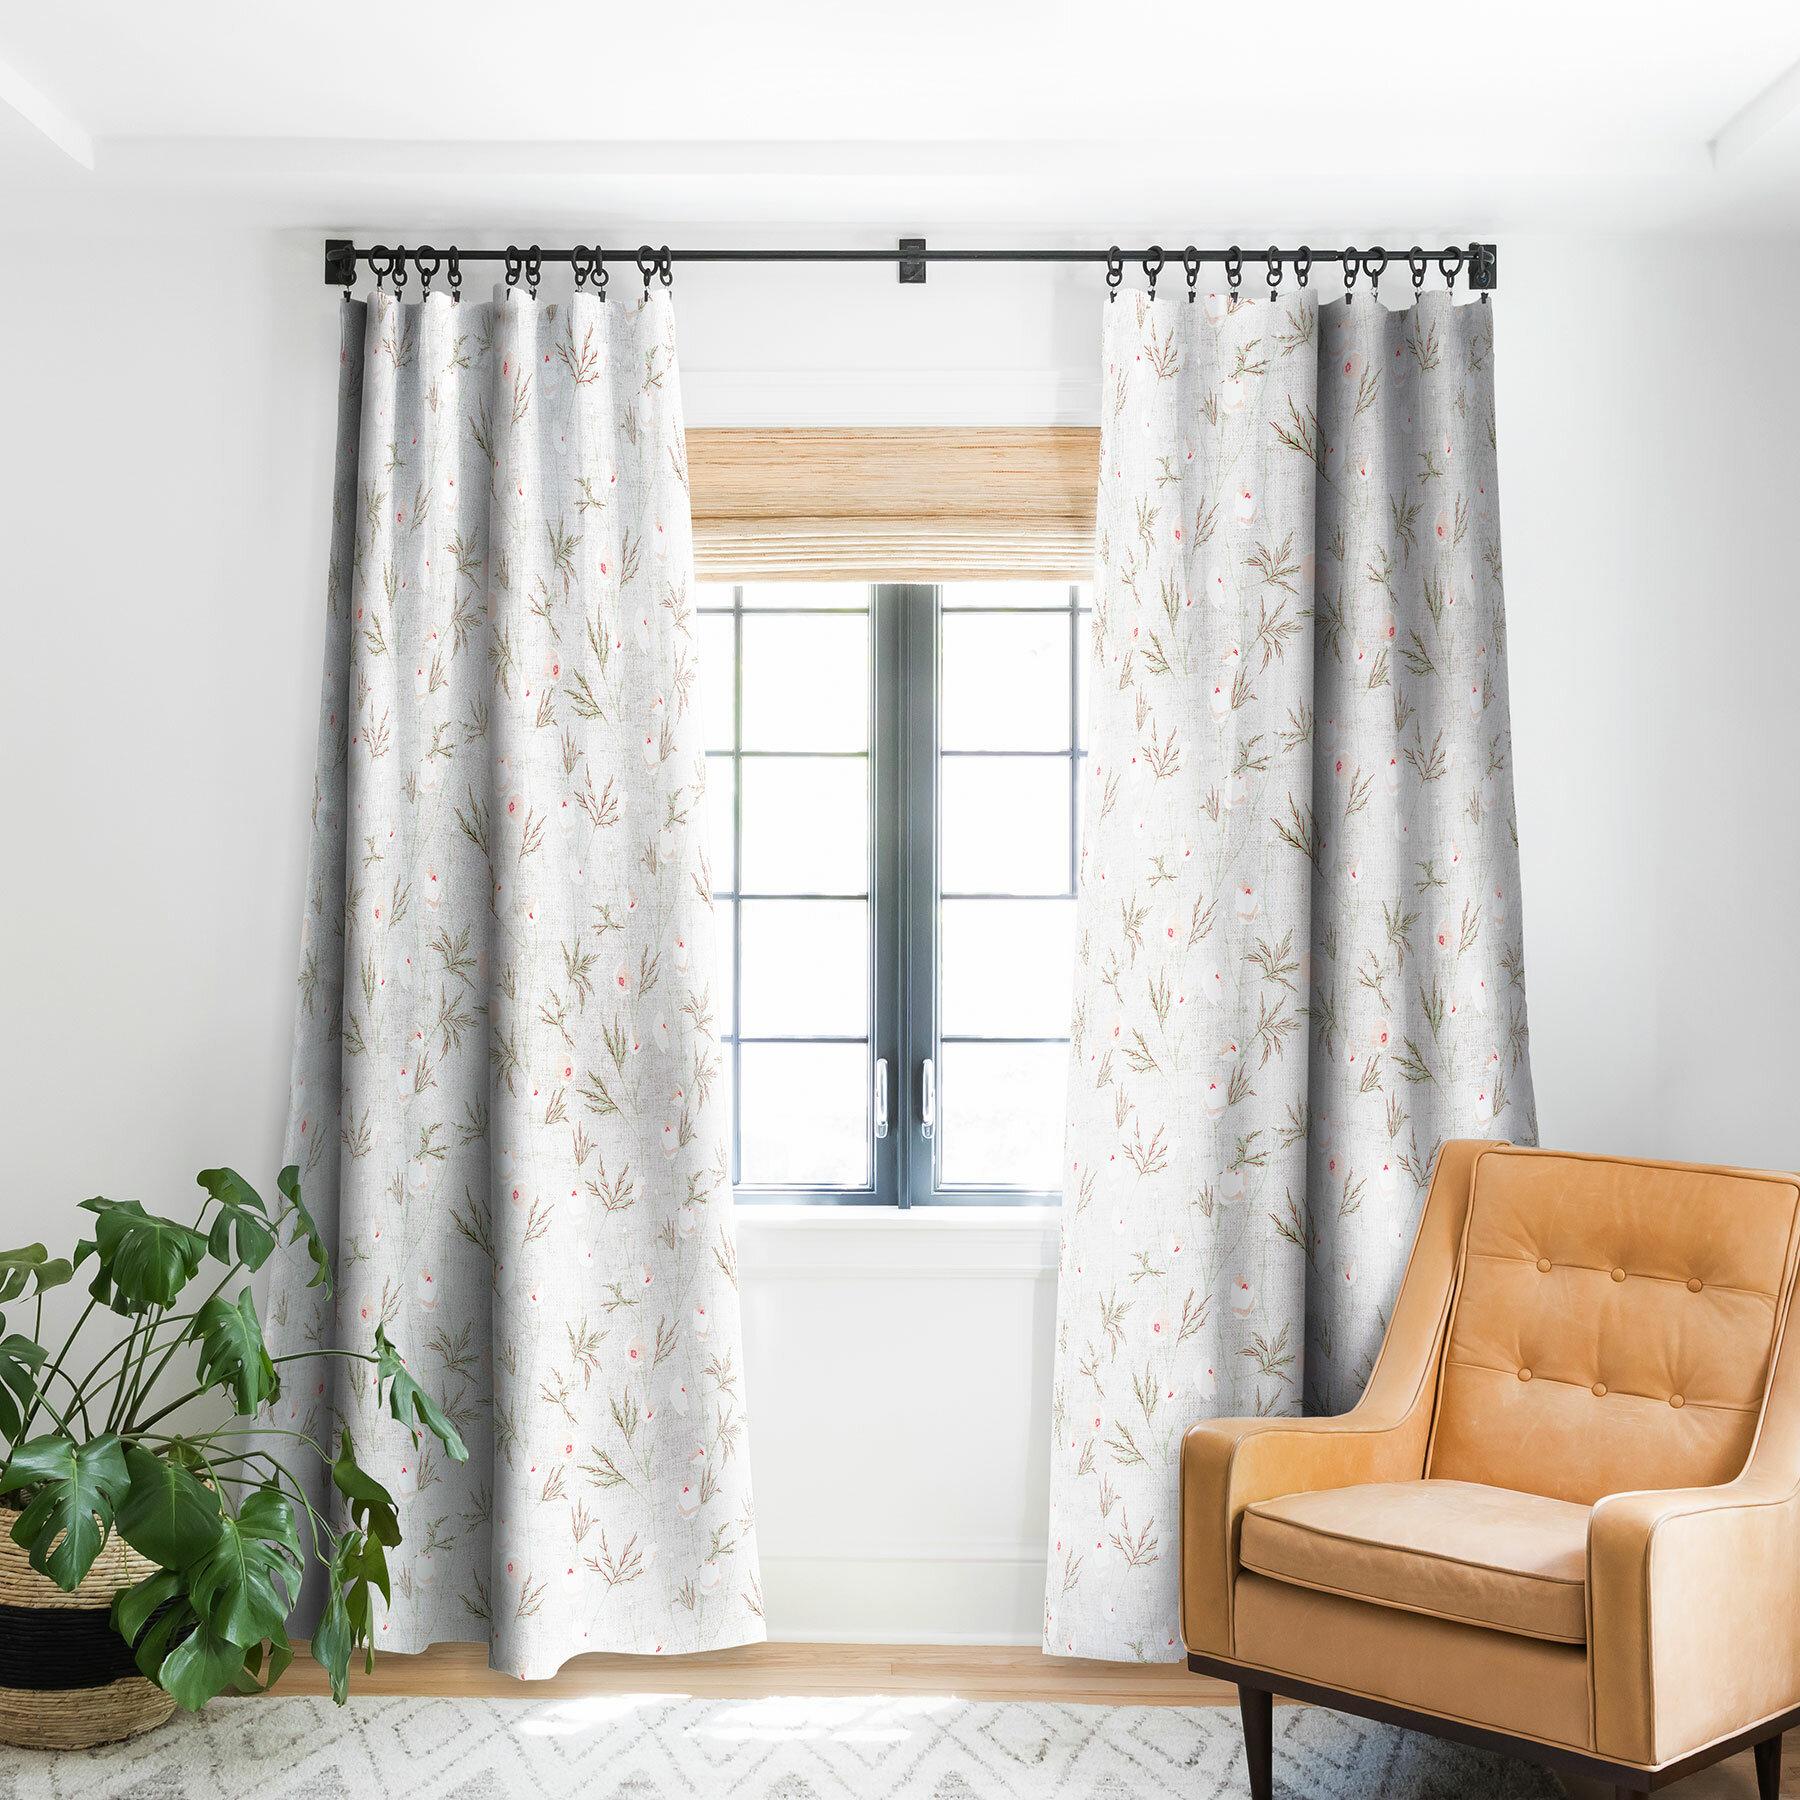 East Urban Home Holli Zollinger French Linen Anemone Light Floral Flower Blackout Pinch Pleat Single Curtain Panel Wayfair